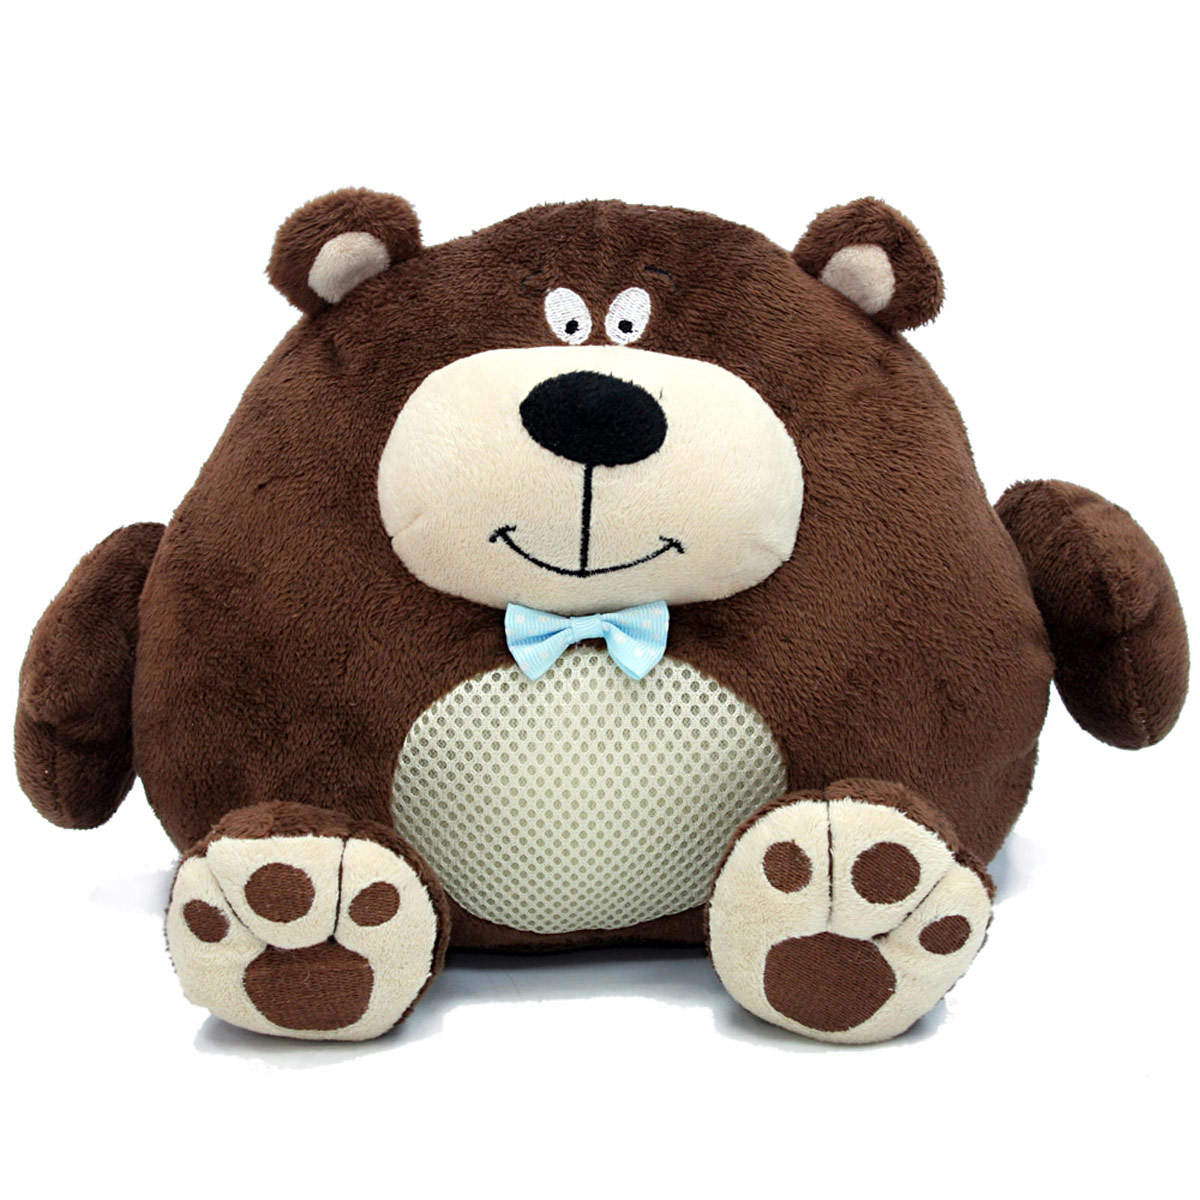 Lapa House Мягкая игрушка Медведь 22 см lapa house мягкая озвученная игрушка собака вид 2 26 см